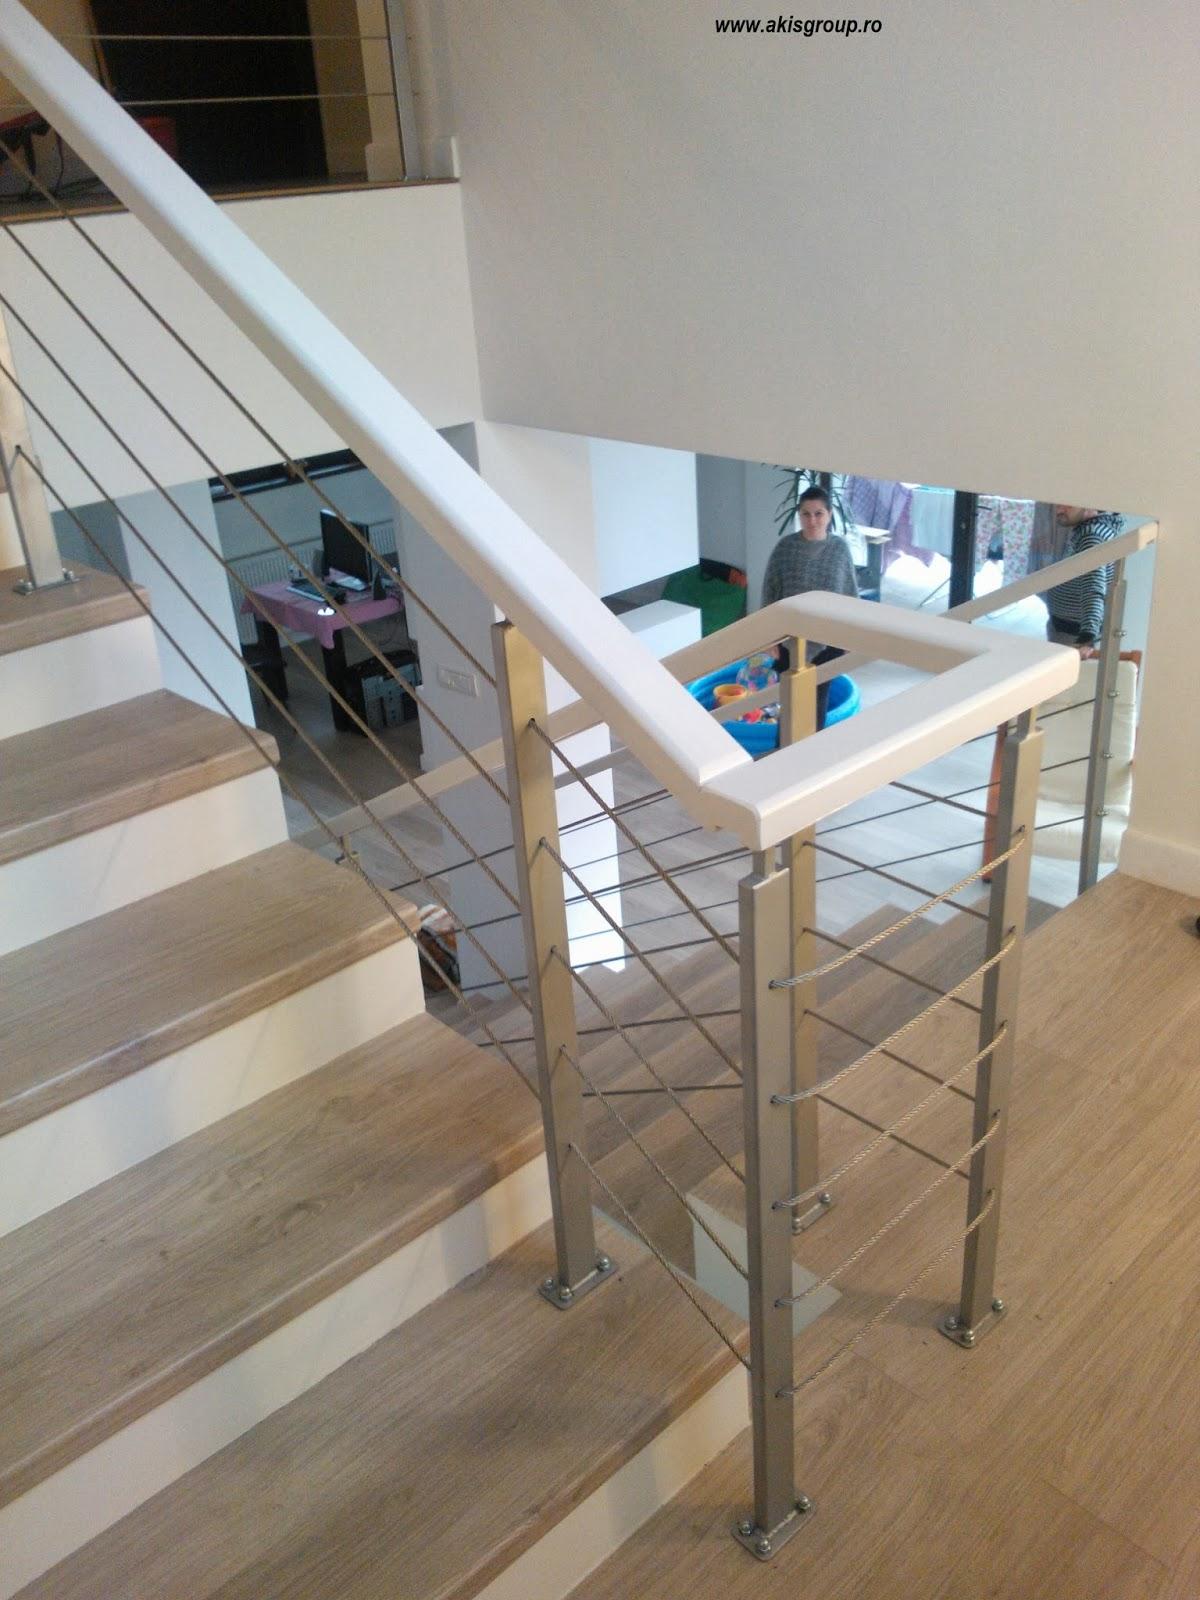 treppengel nder holz innen bausatz. Black Bedroom Furniture Sets. Home Design Ideas